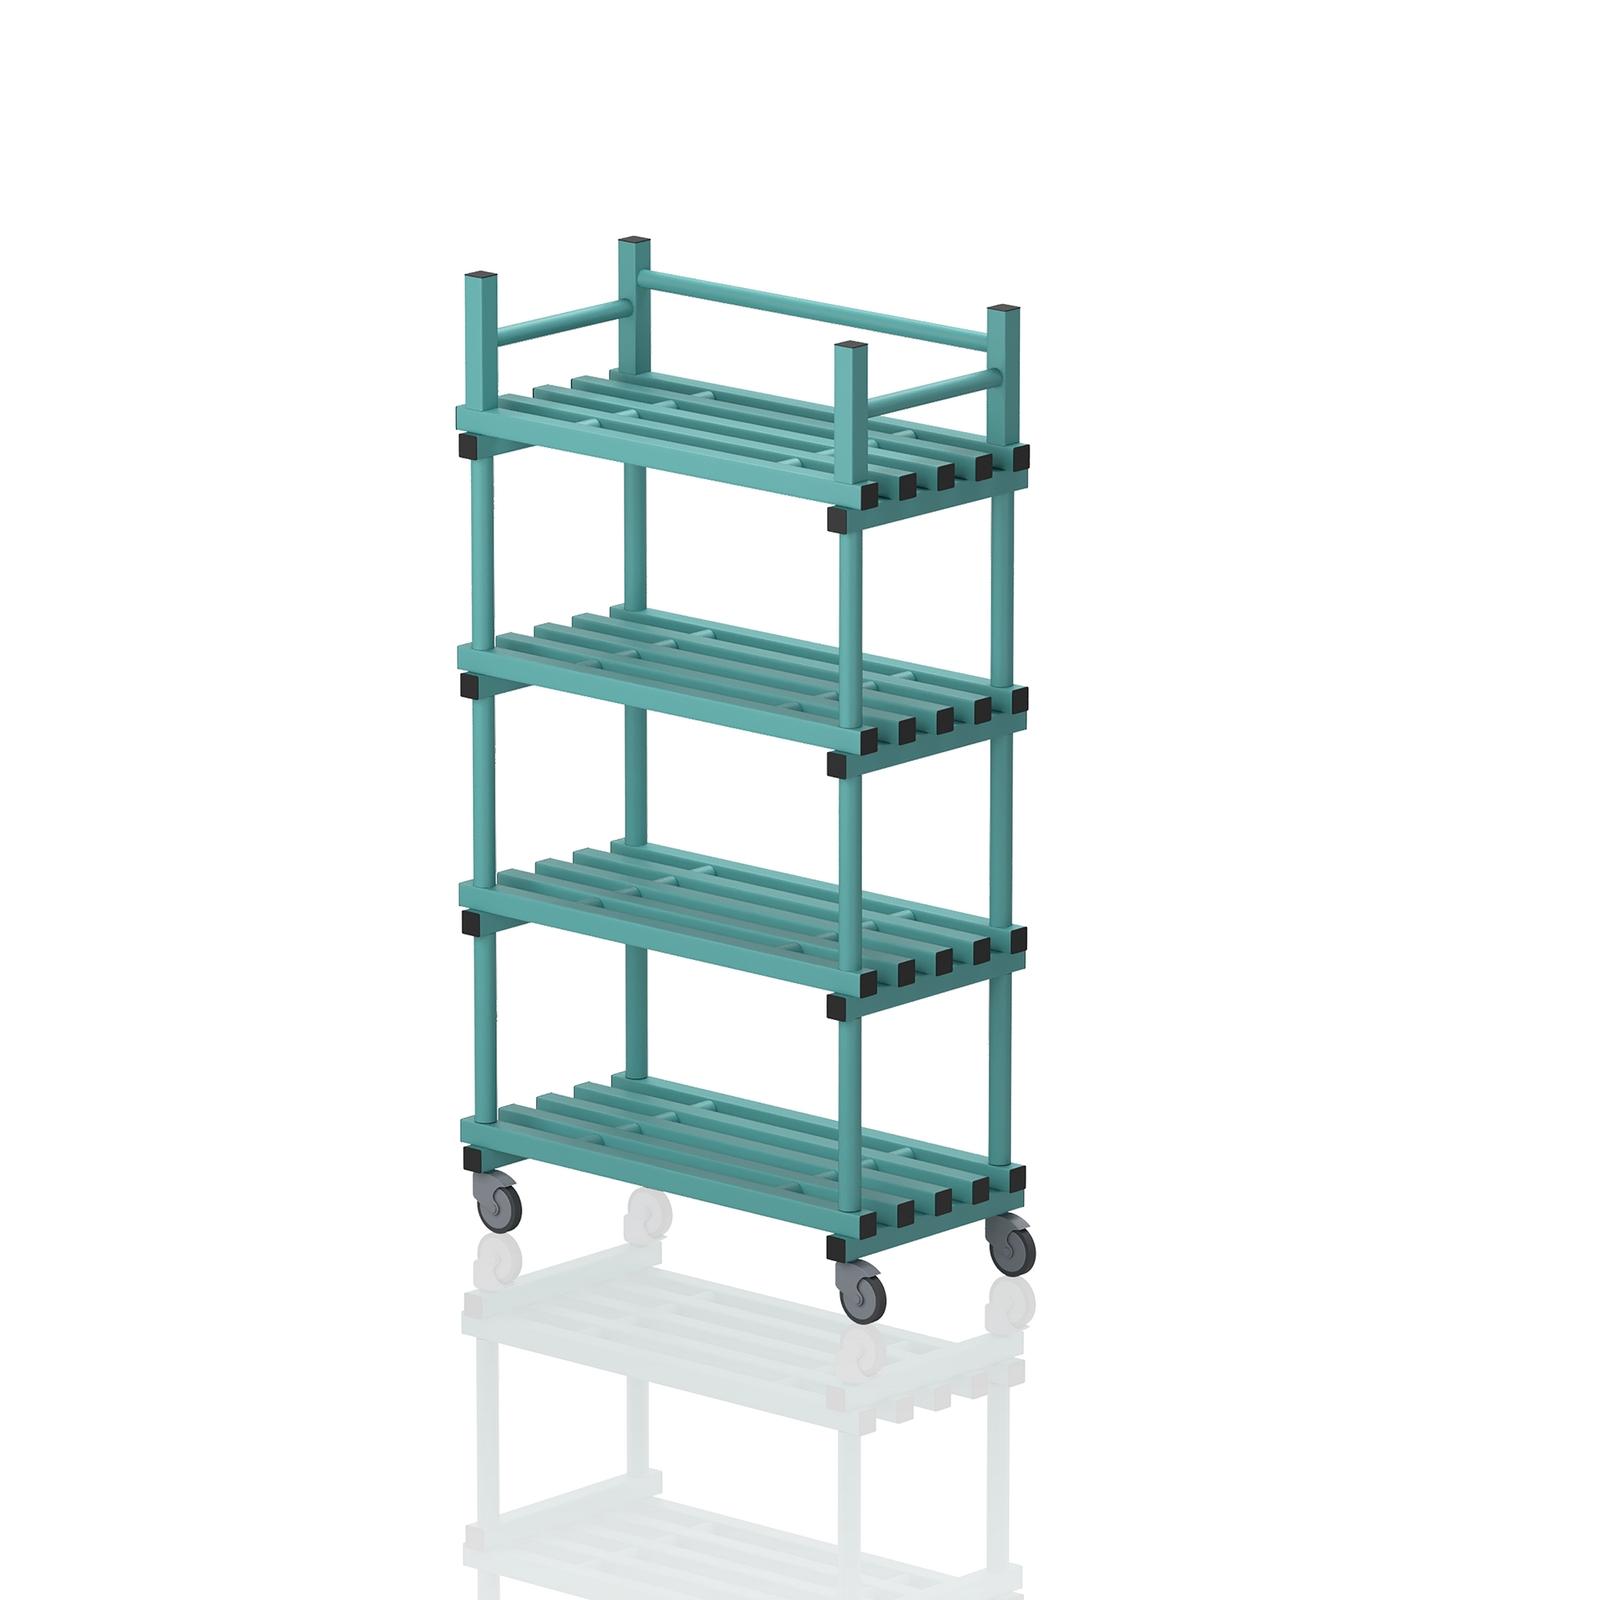 Mobile Shelving Unit Aqua